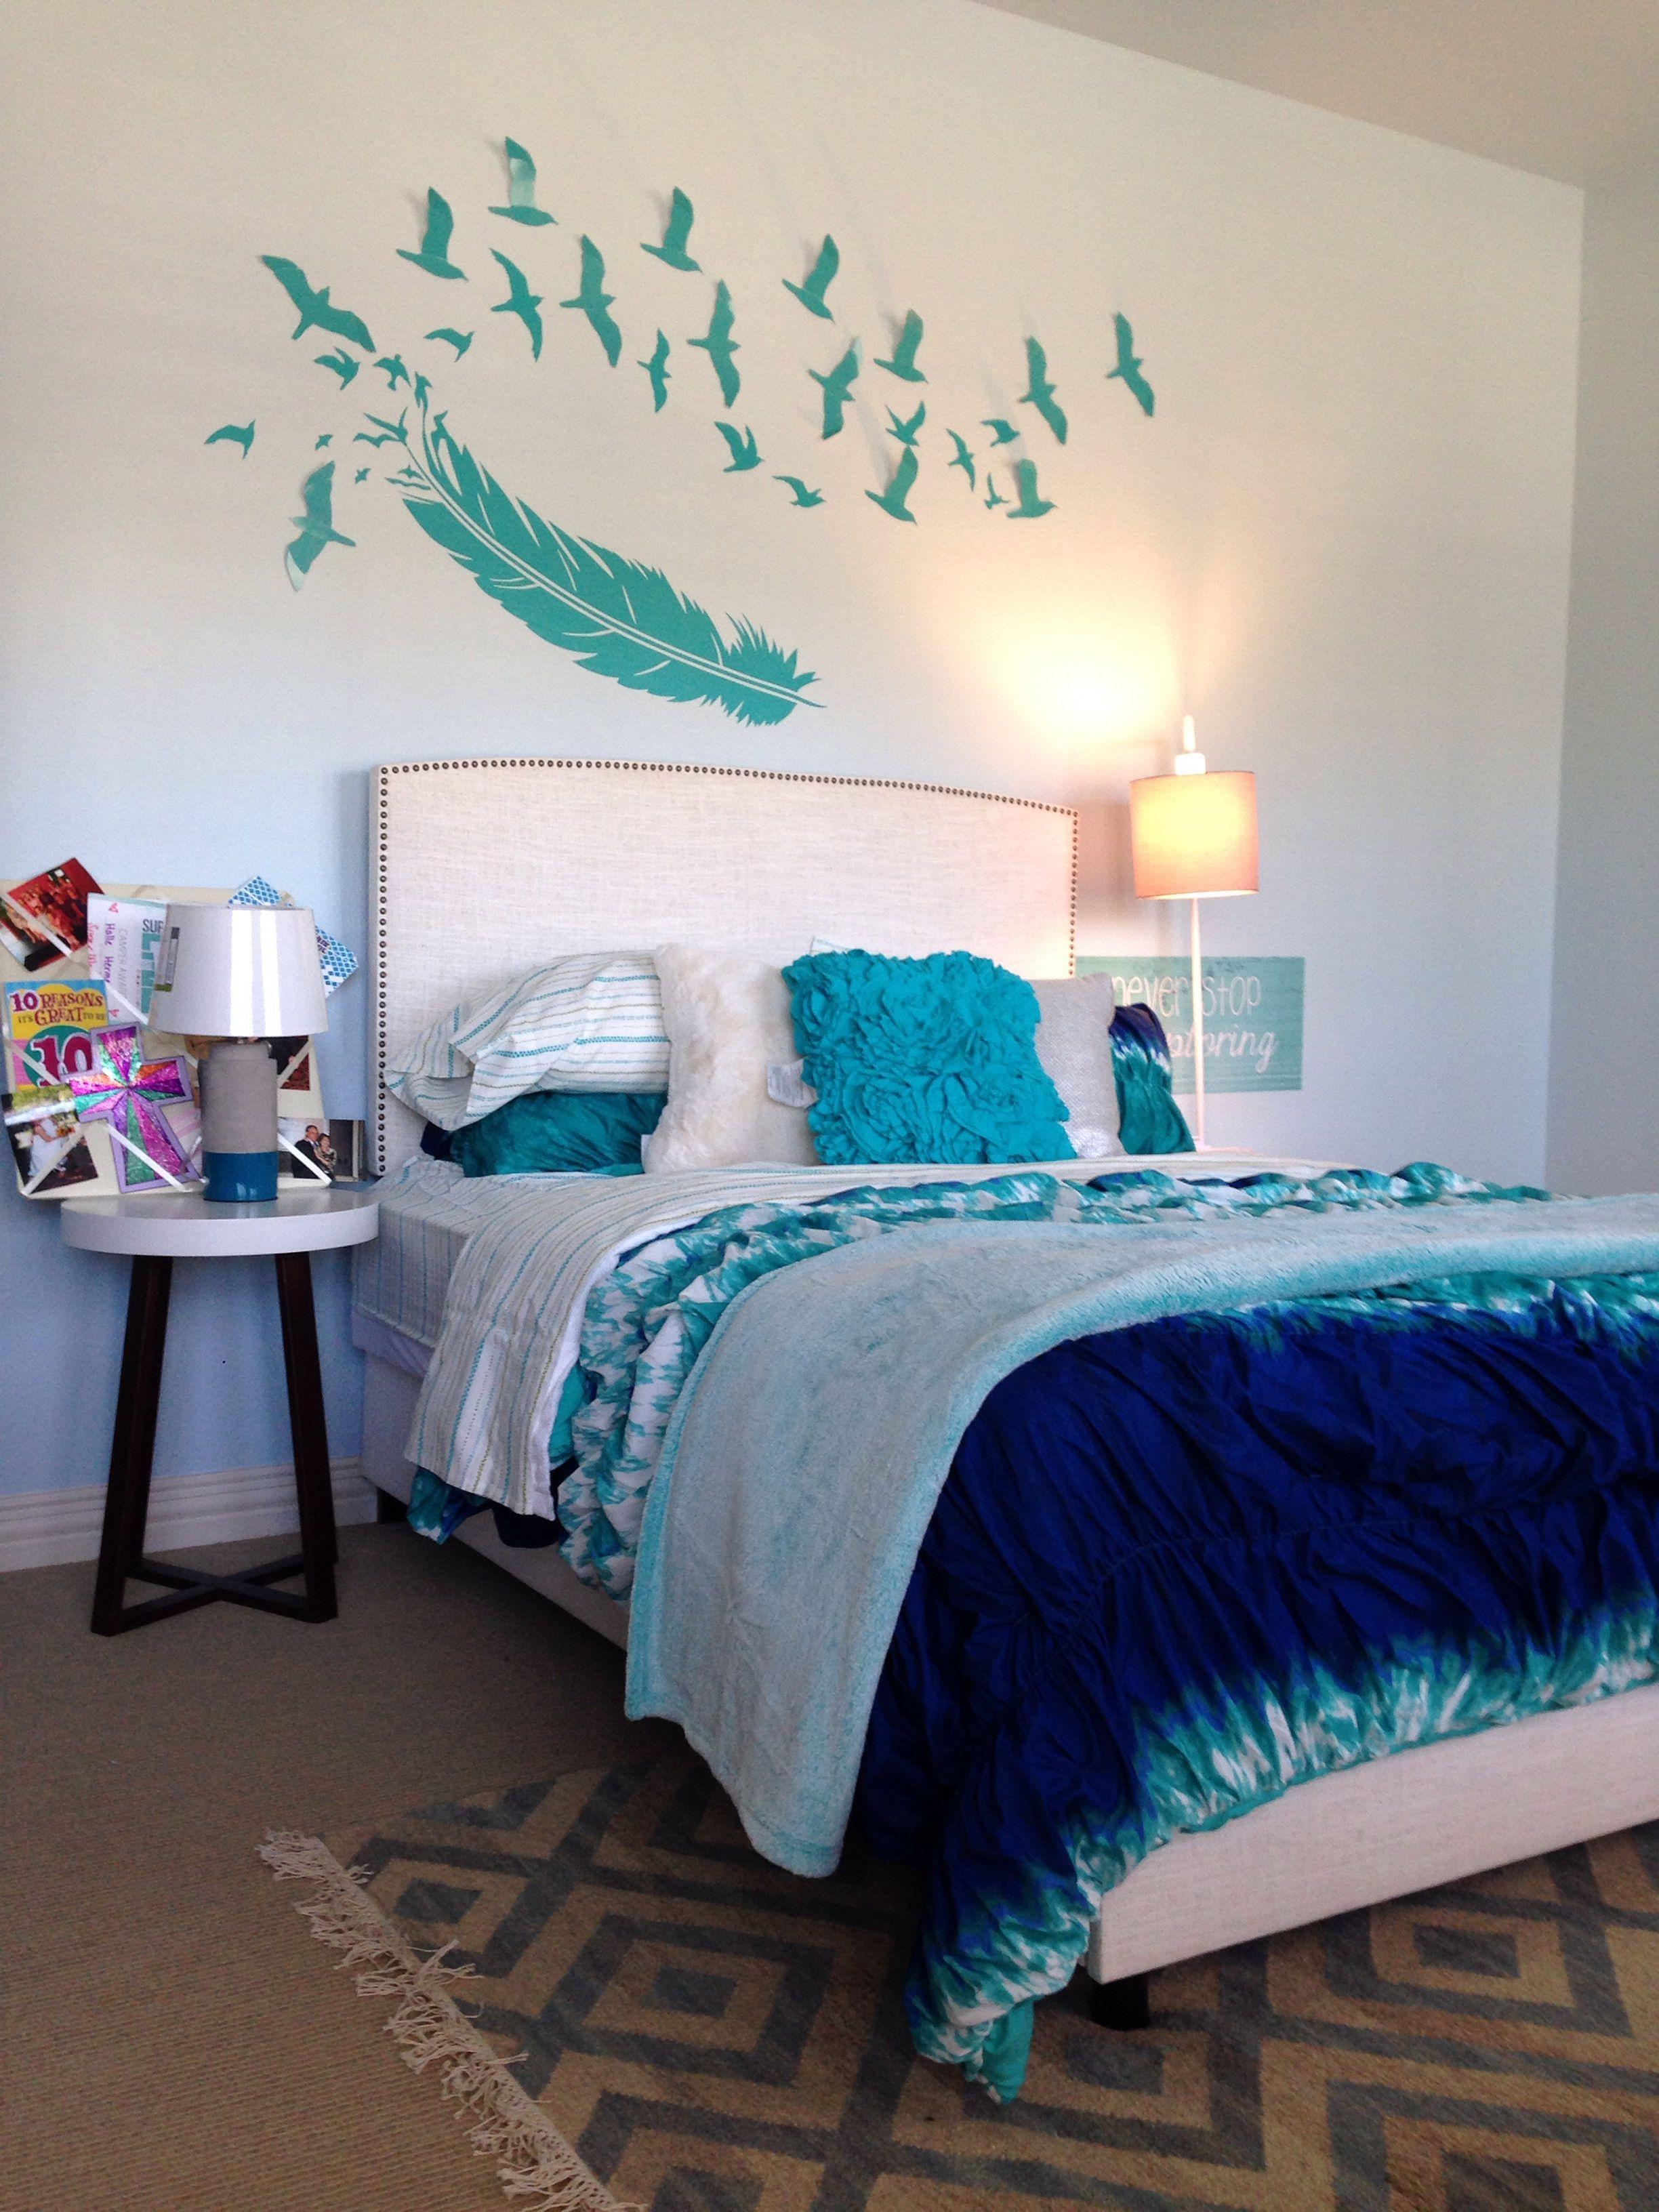 outstanding teen girl bedroom ideas | Pin on Bedroom Ideas & Inspiration